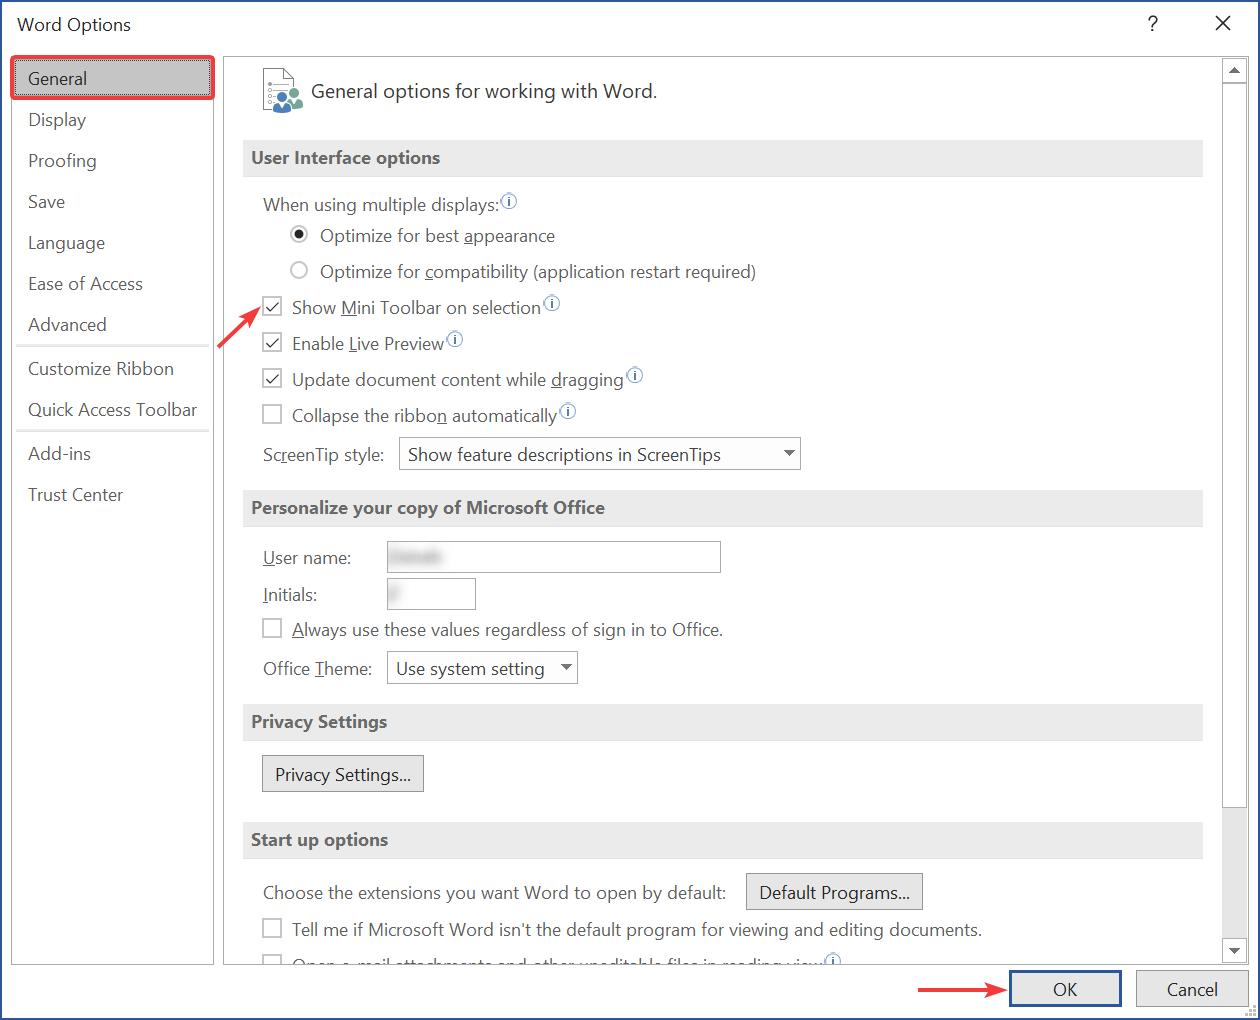 Show Mini Toolbar on selection